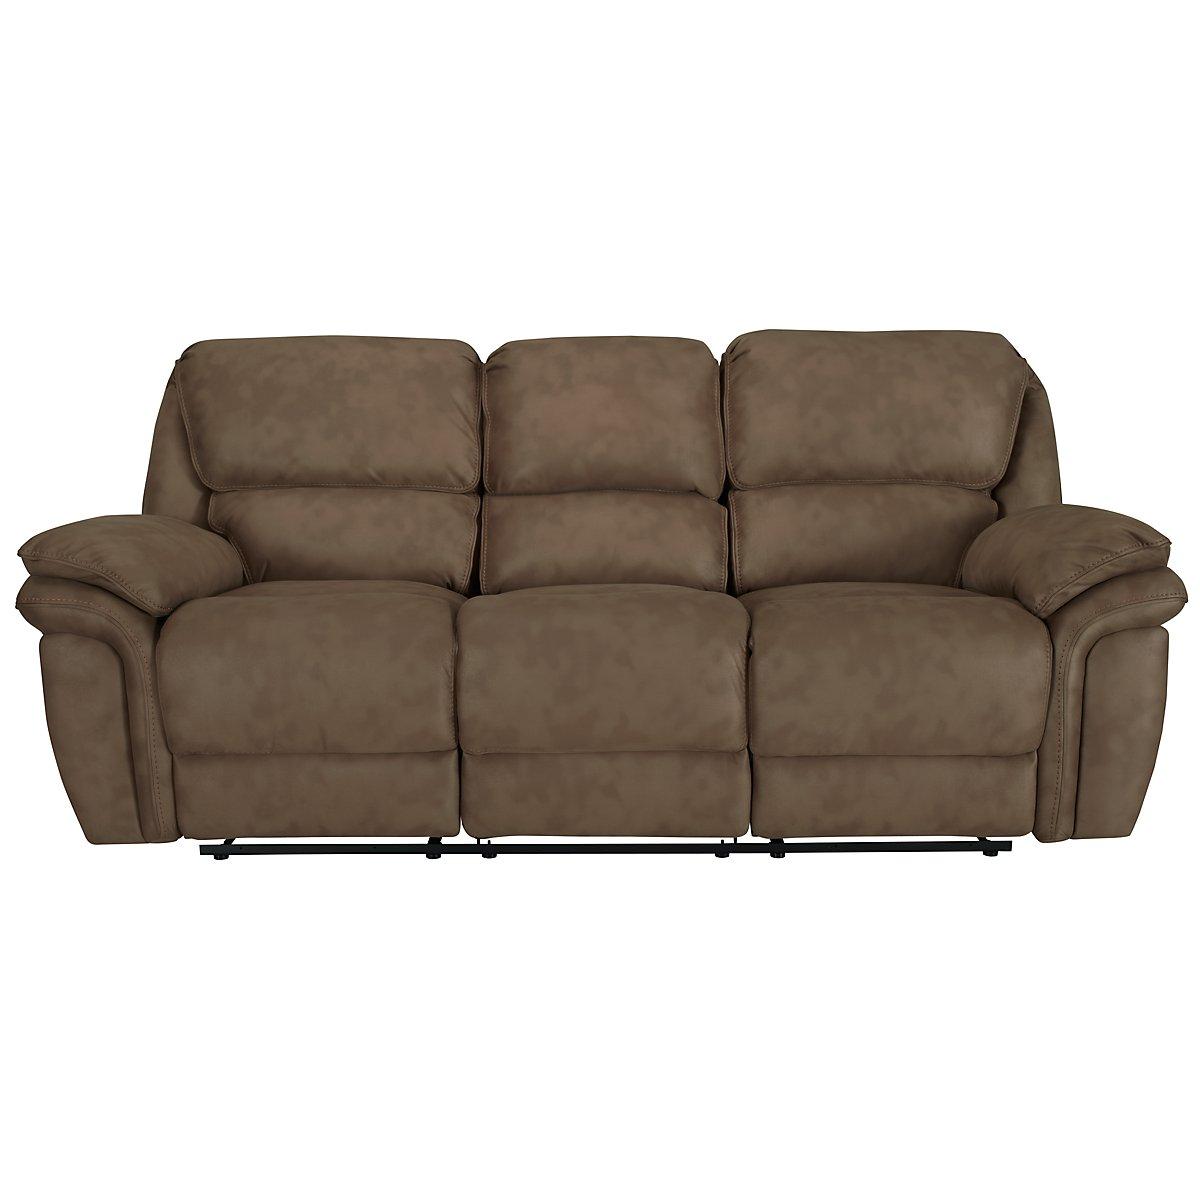 Kirsten Medium Brown Microfiber Reclining Sofa